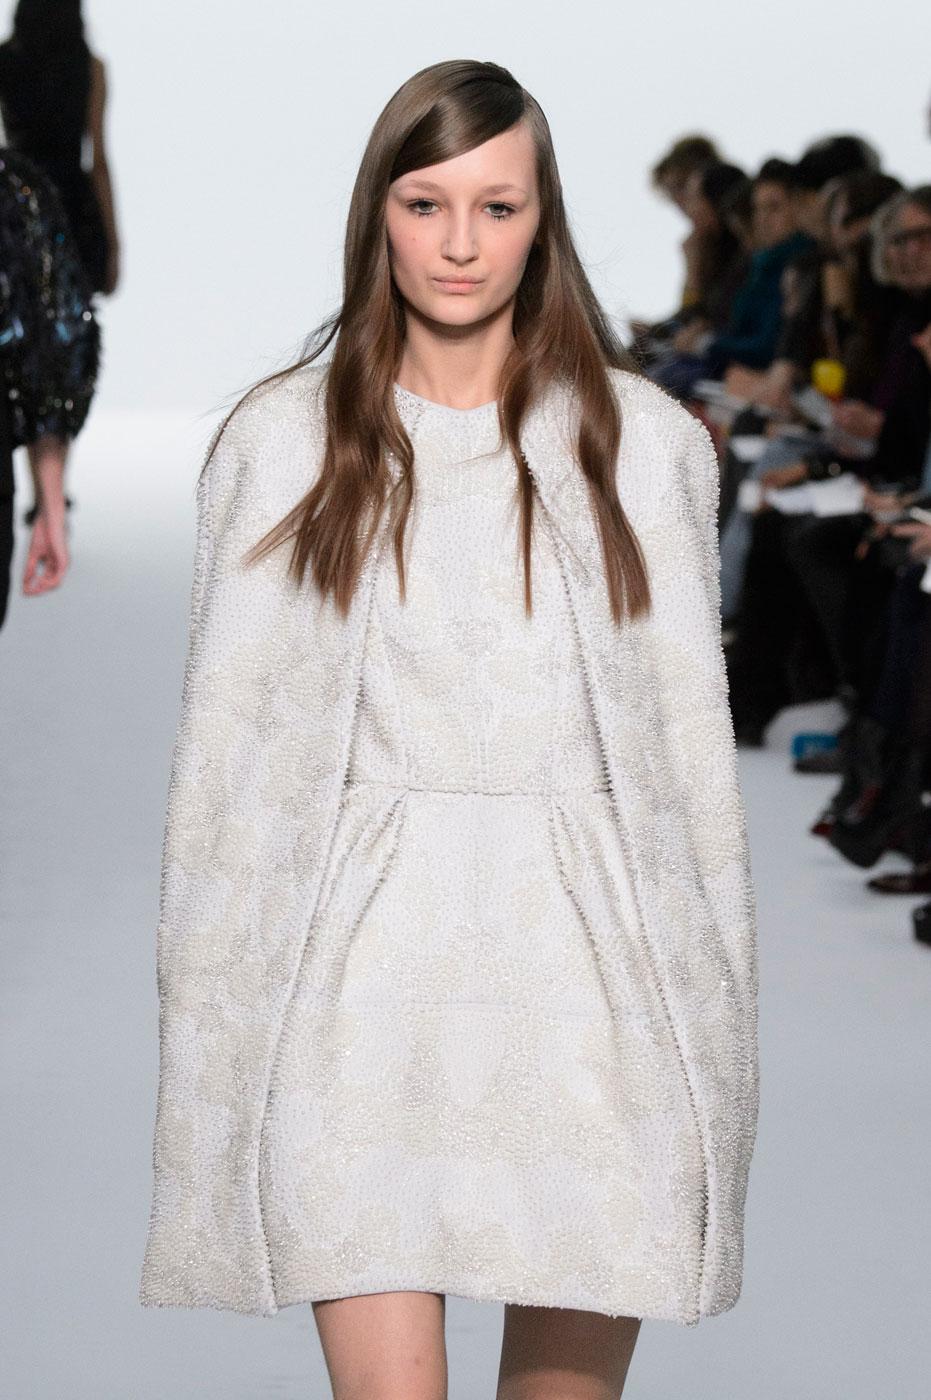 Kayek-fashion-runway-show-haute-couture-paris-spring-summer-2015-the-impression-46